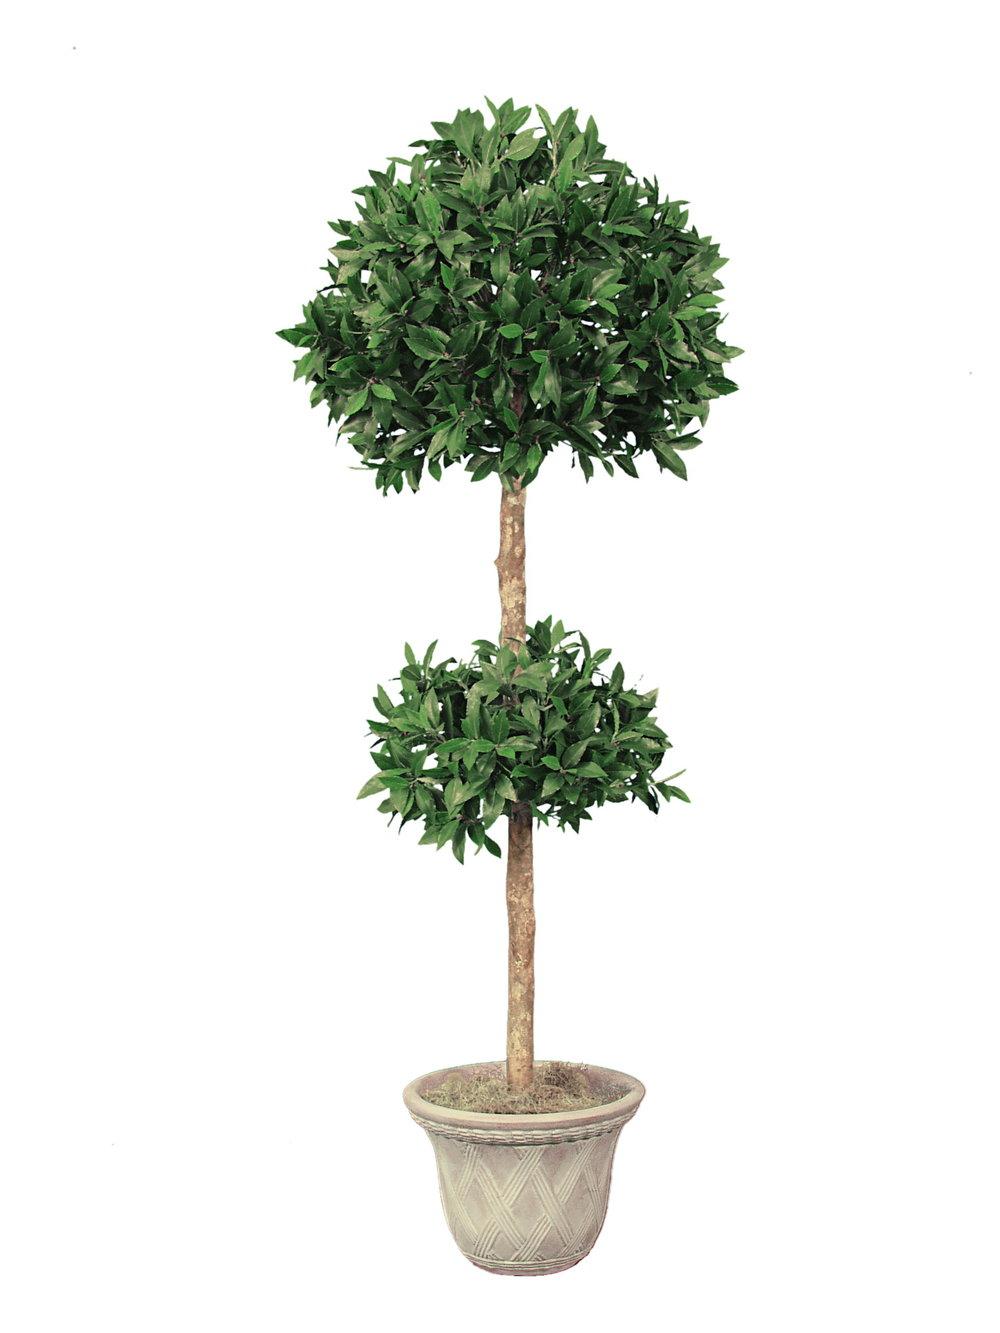 TSP 5571- Boxwood Topiary